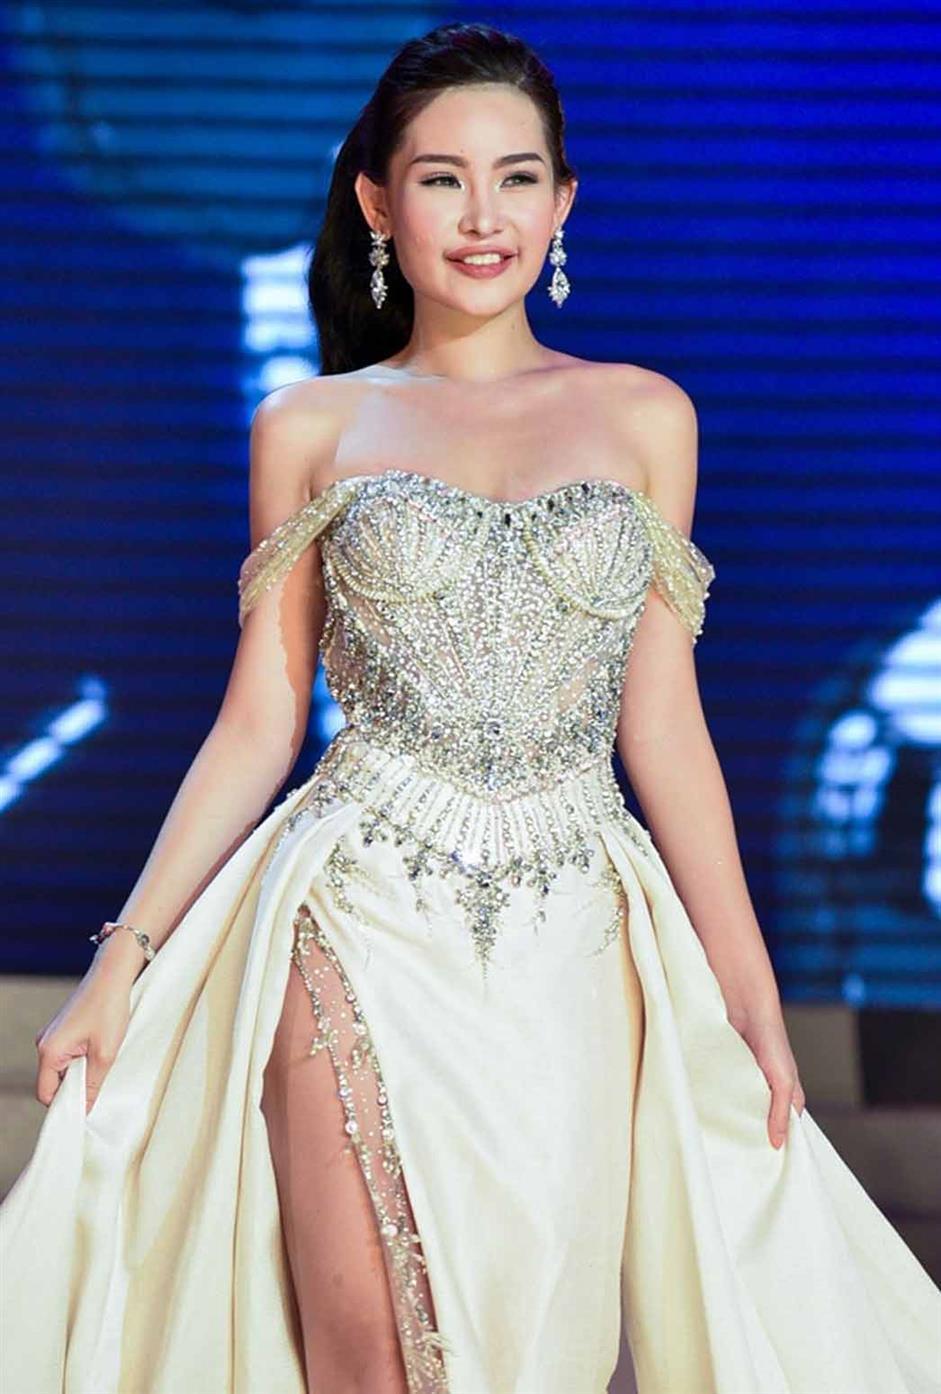 Ngân Anh Lê Âu represented Vietnam at Miss Intercontinental 2018